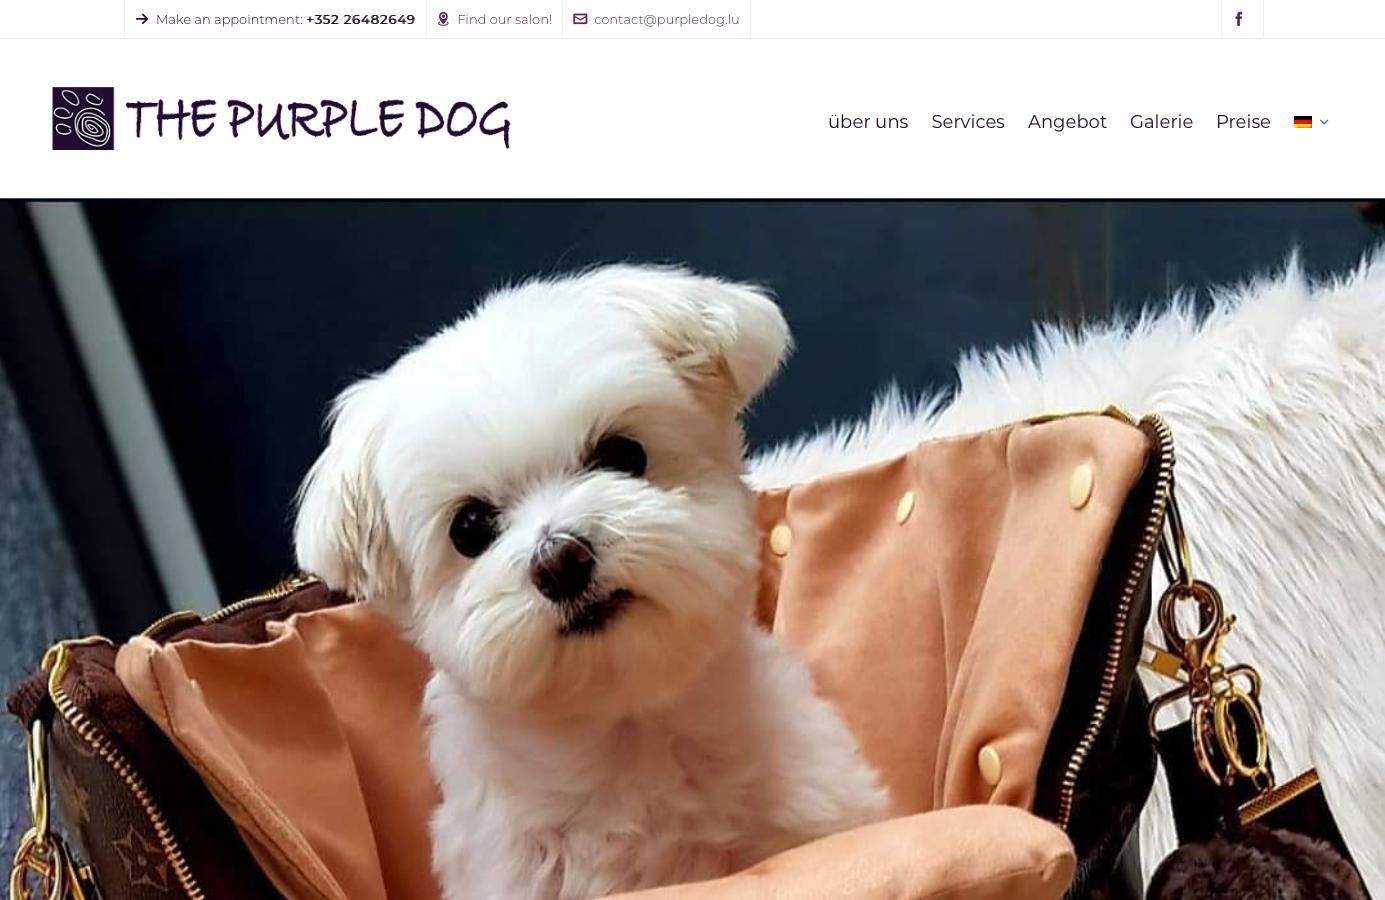 Hundesalon Webseite mit Terminbuchung